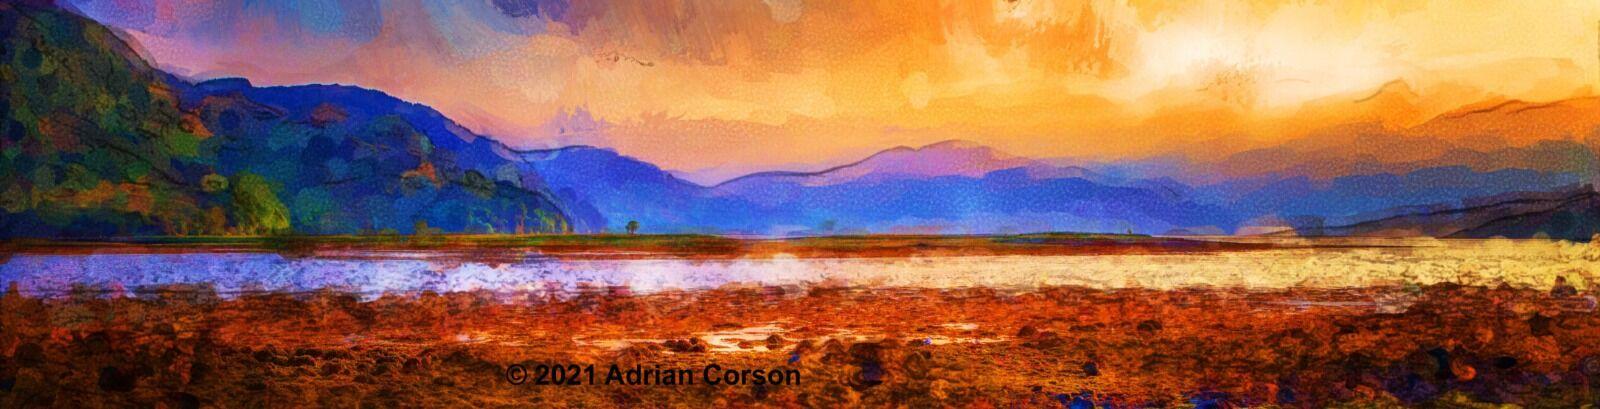 172-loch sunset